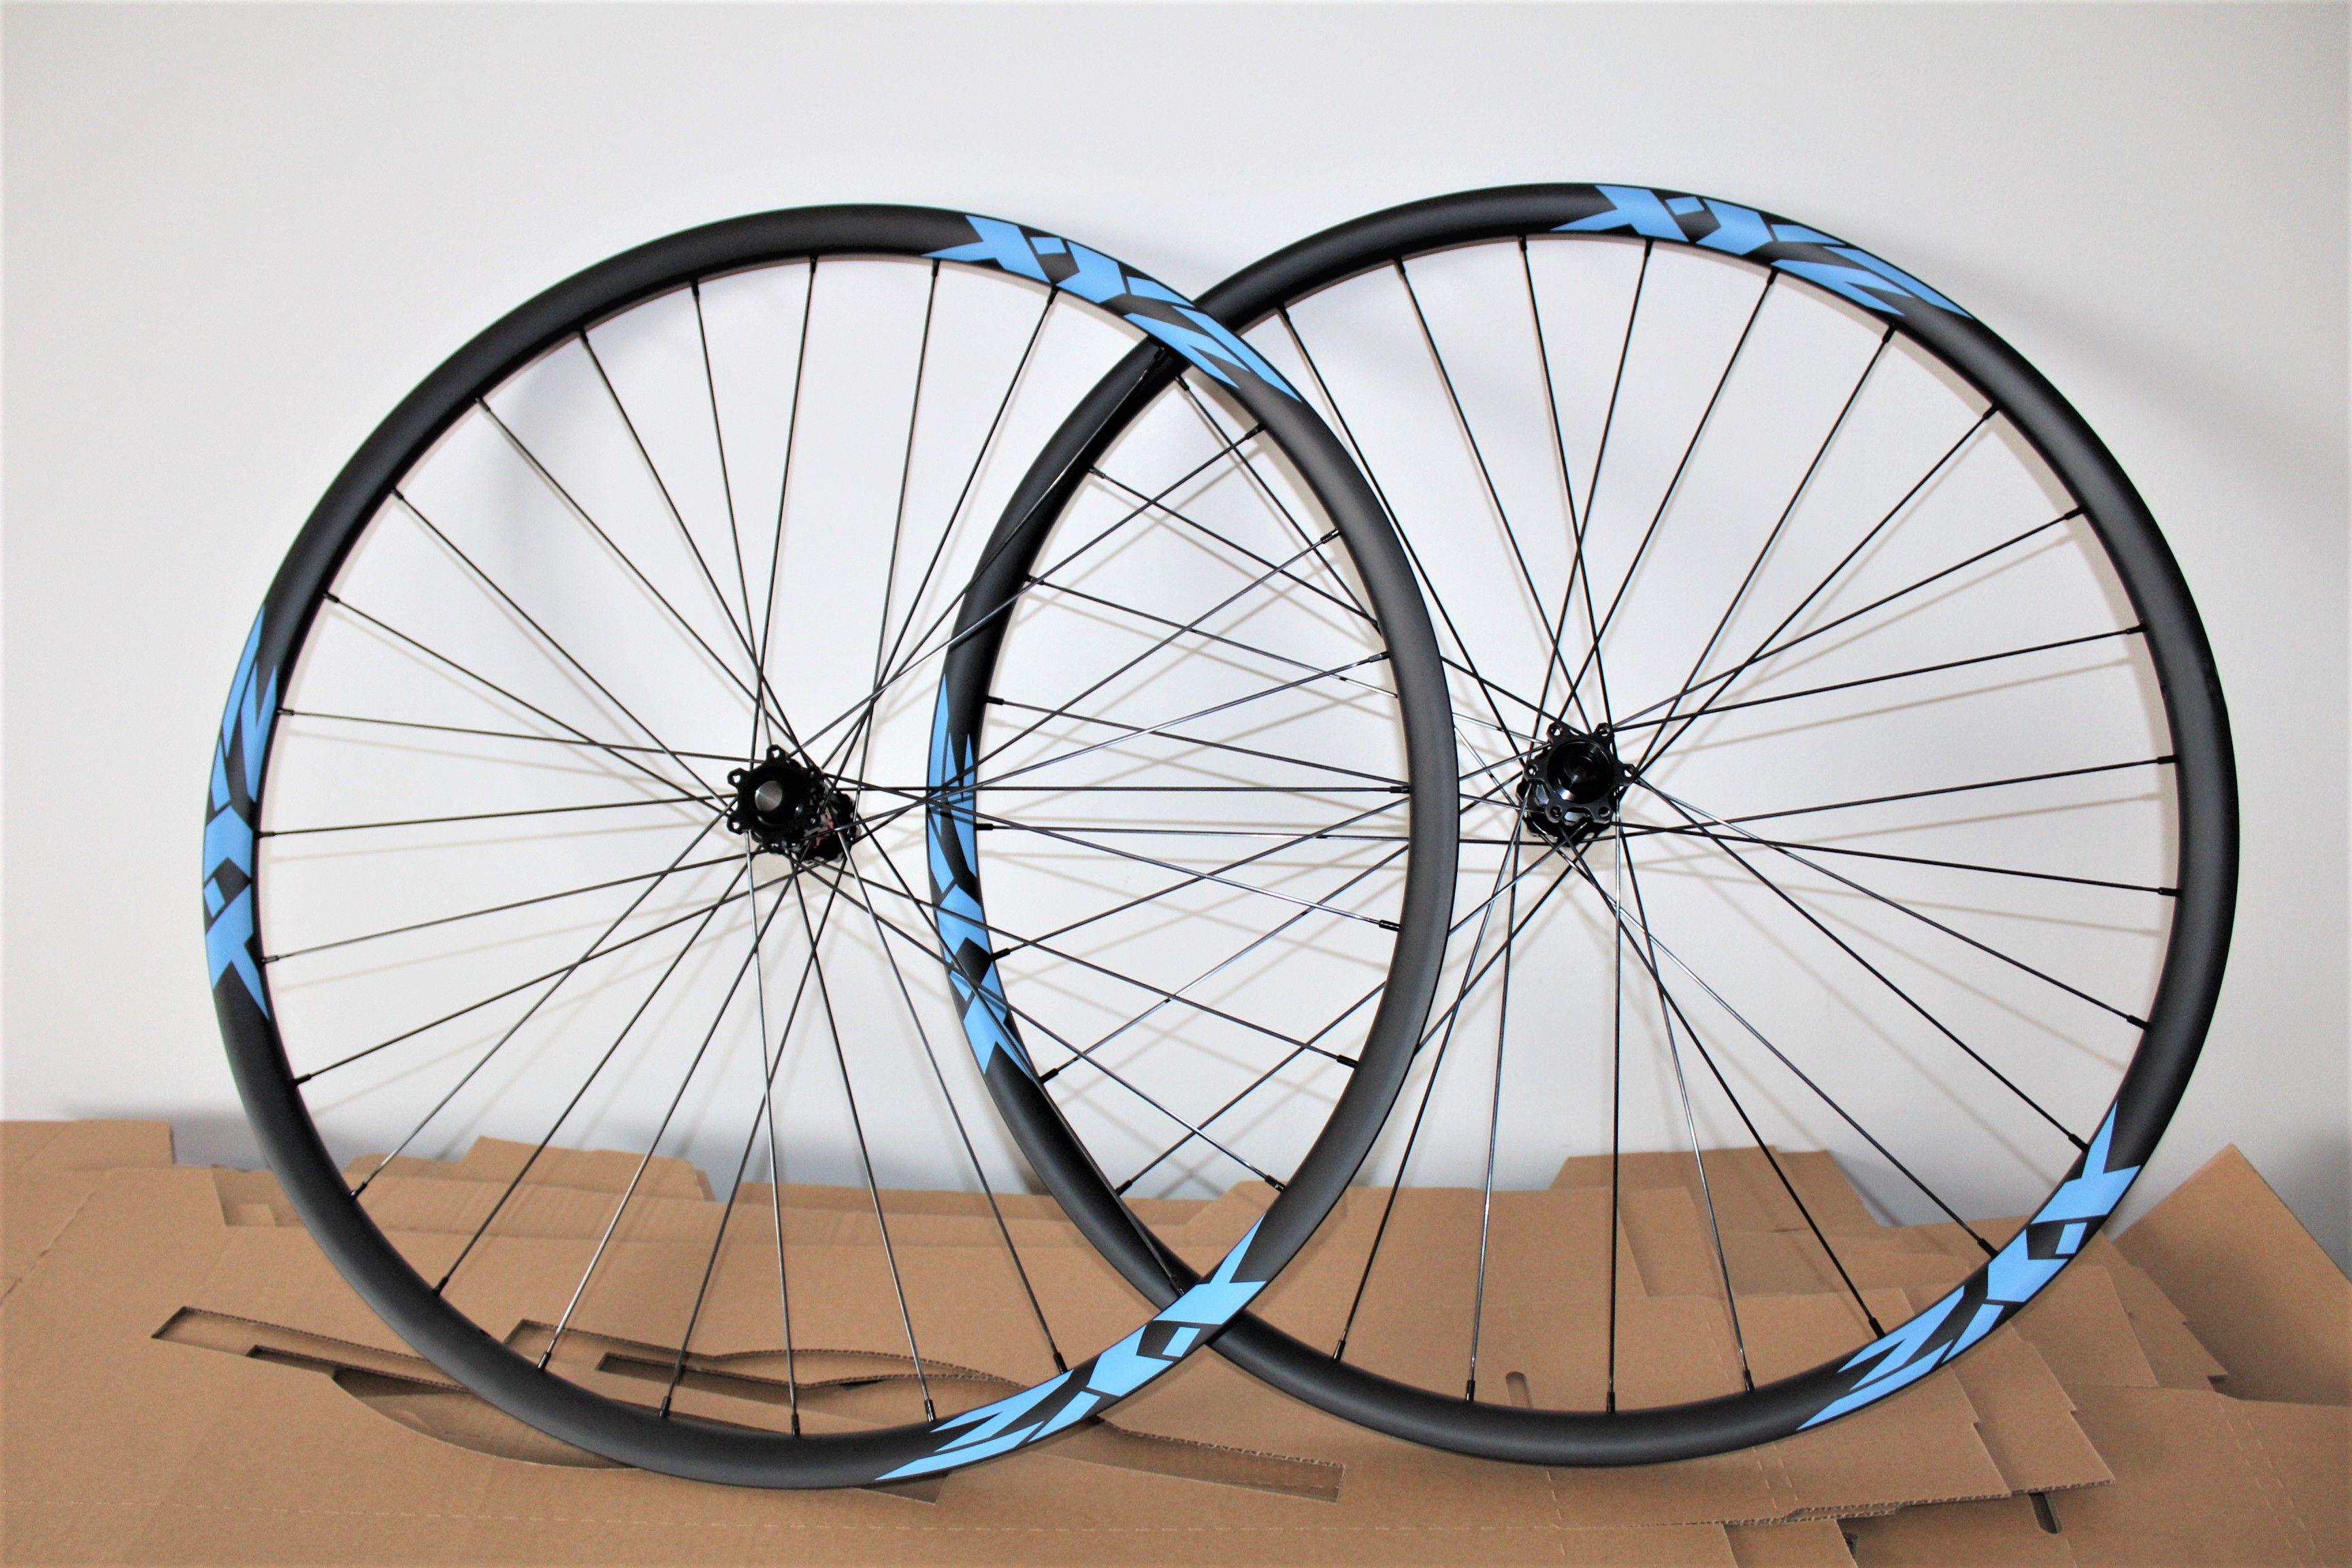 Free Shipping Xyz High End T800 Carbon 29 Inch Mountain Bike